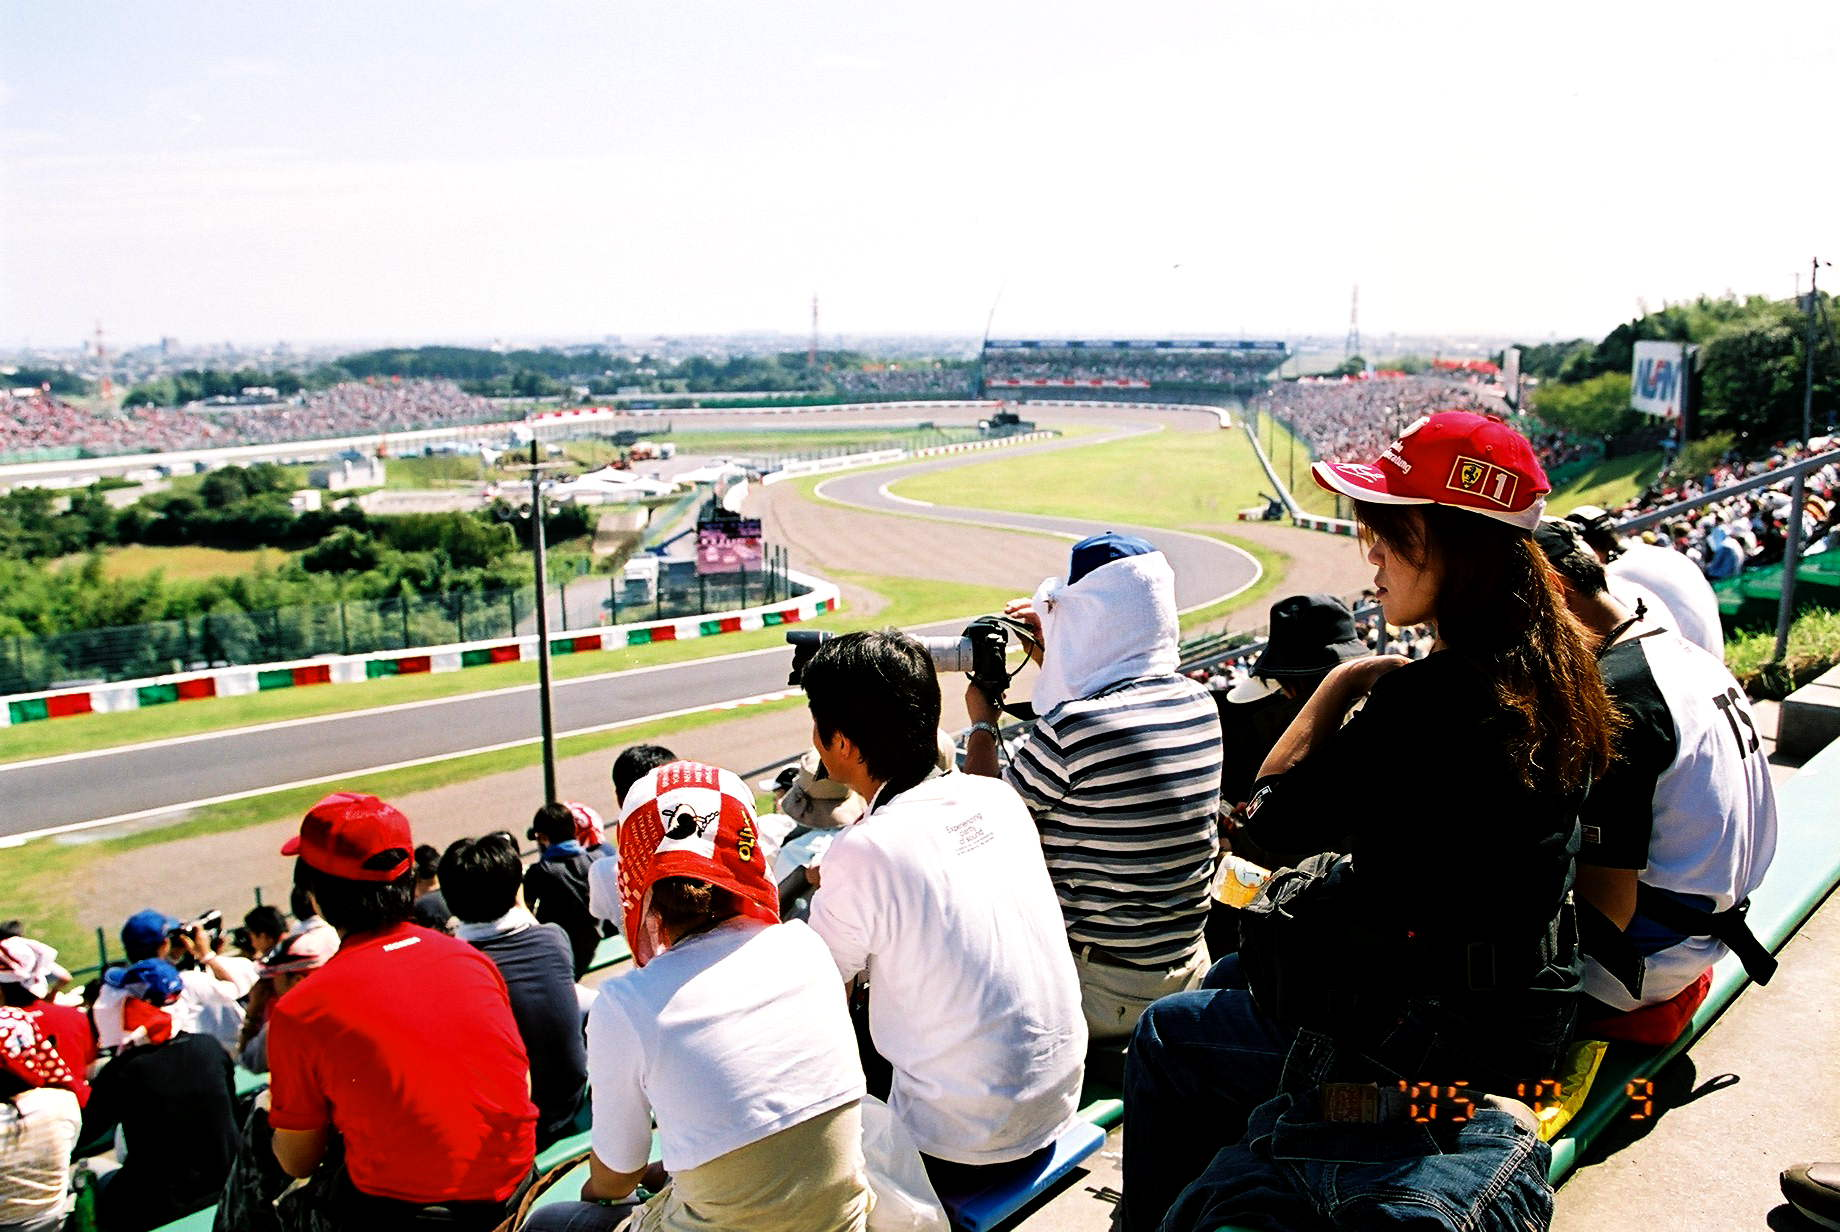 F1グランプリ鈴鹿復活2009 04[F1 2005 in 鈴鹿写真撮影編]_b0157849_23204462.jpg